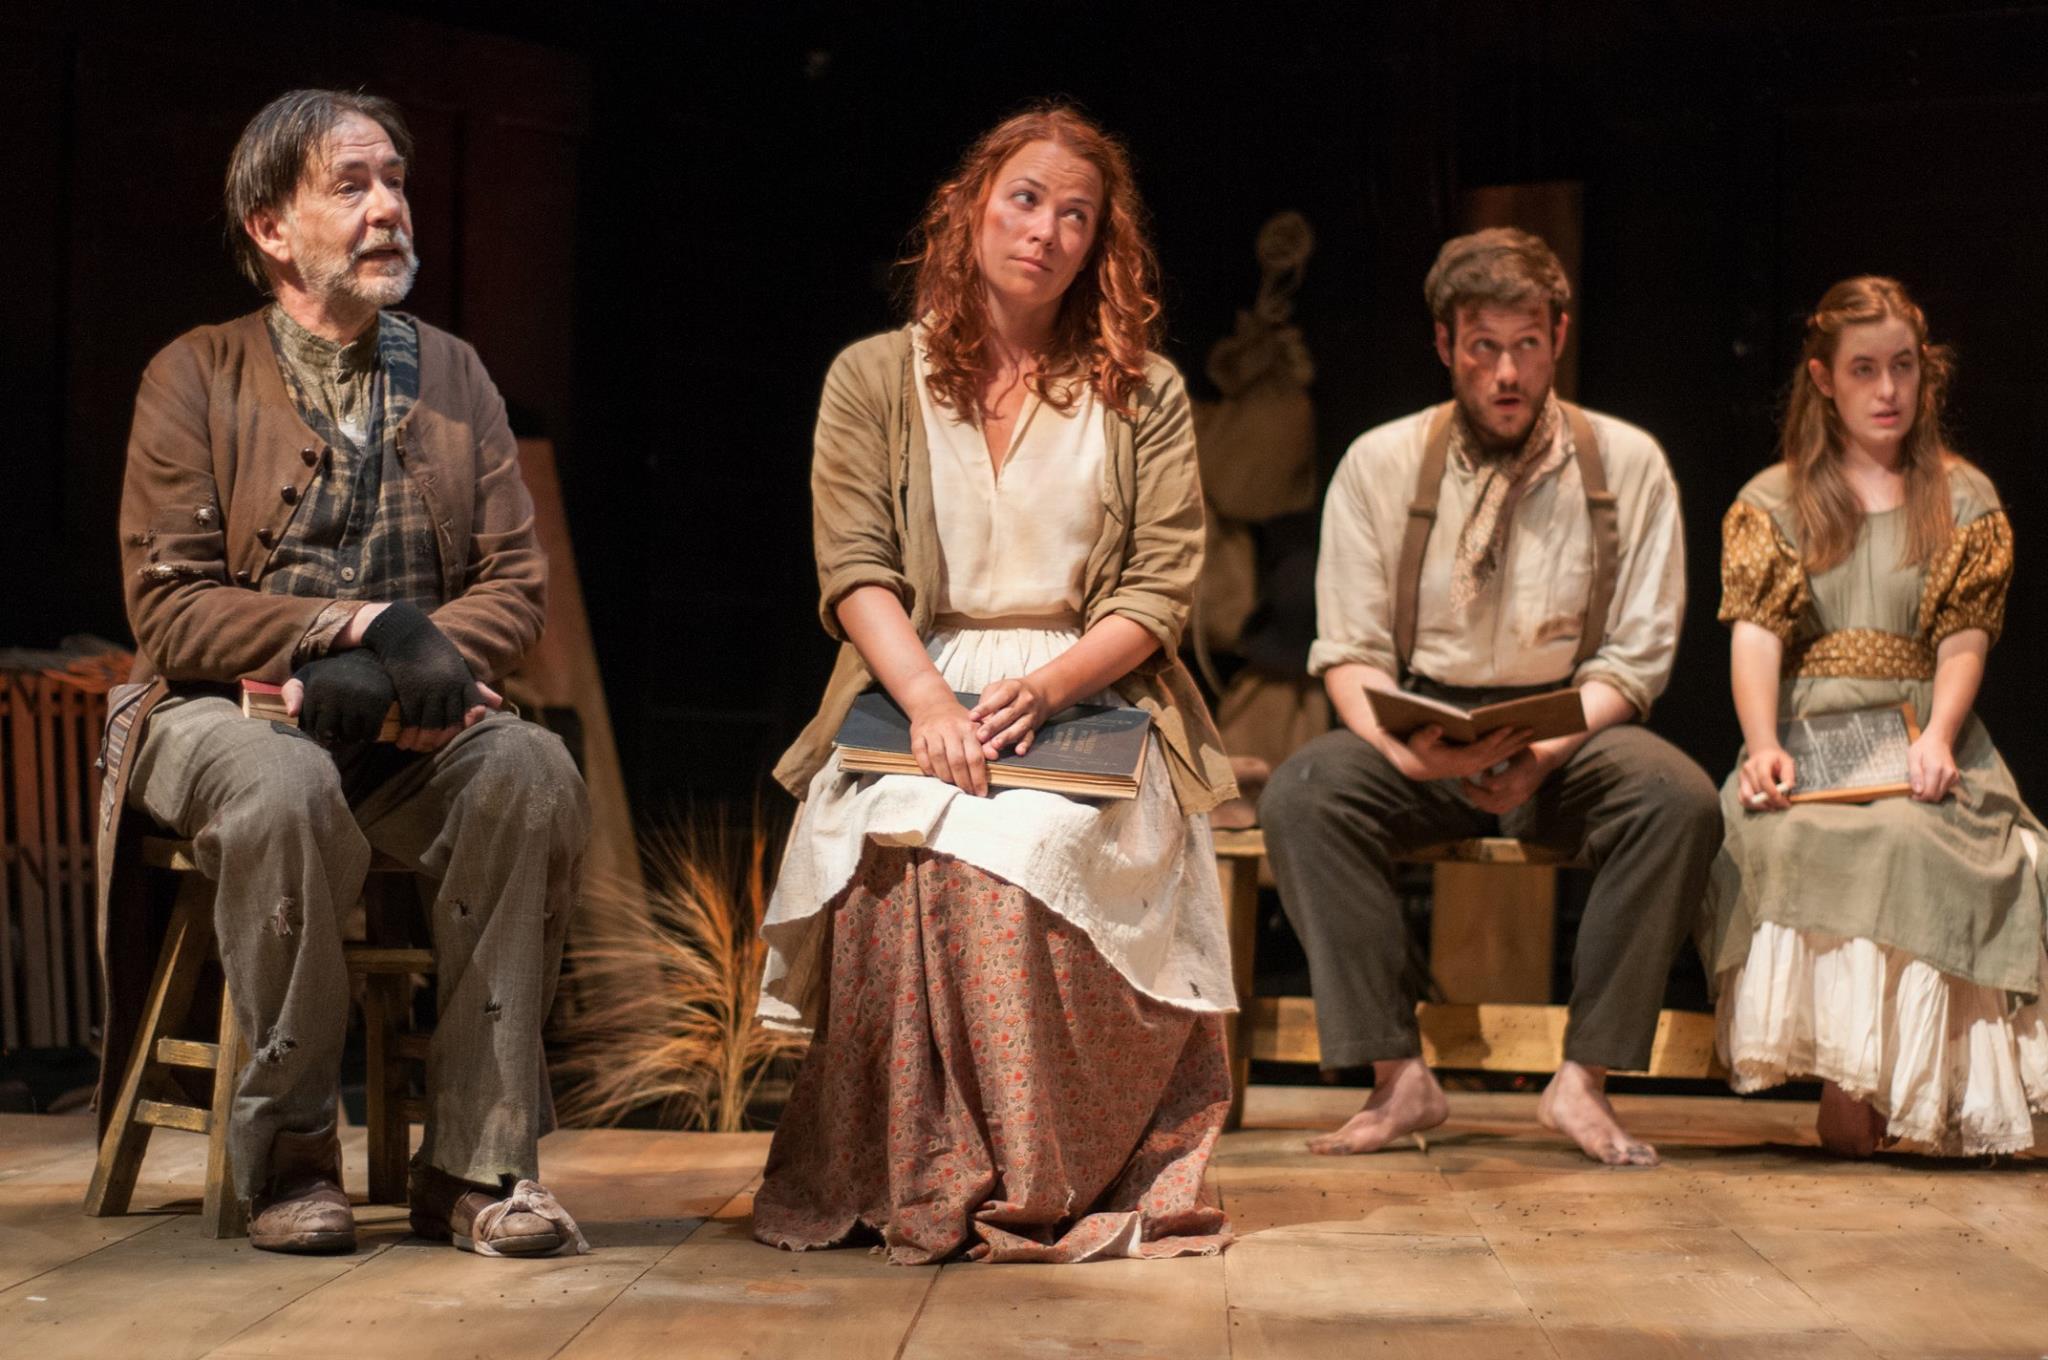 Kevin Fennessy, Sarah Elizabeth Bedard, Greg Maraio, and Margaret Clark in Translations . Photo: Paul Cantillon / LIDEC Photo